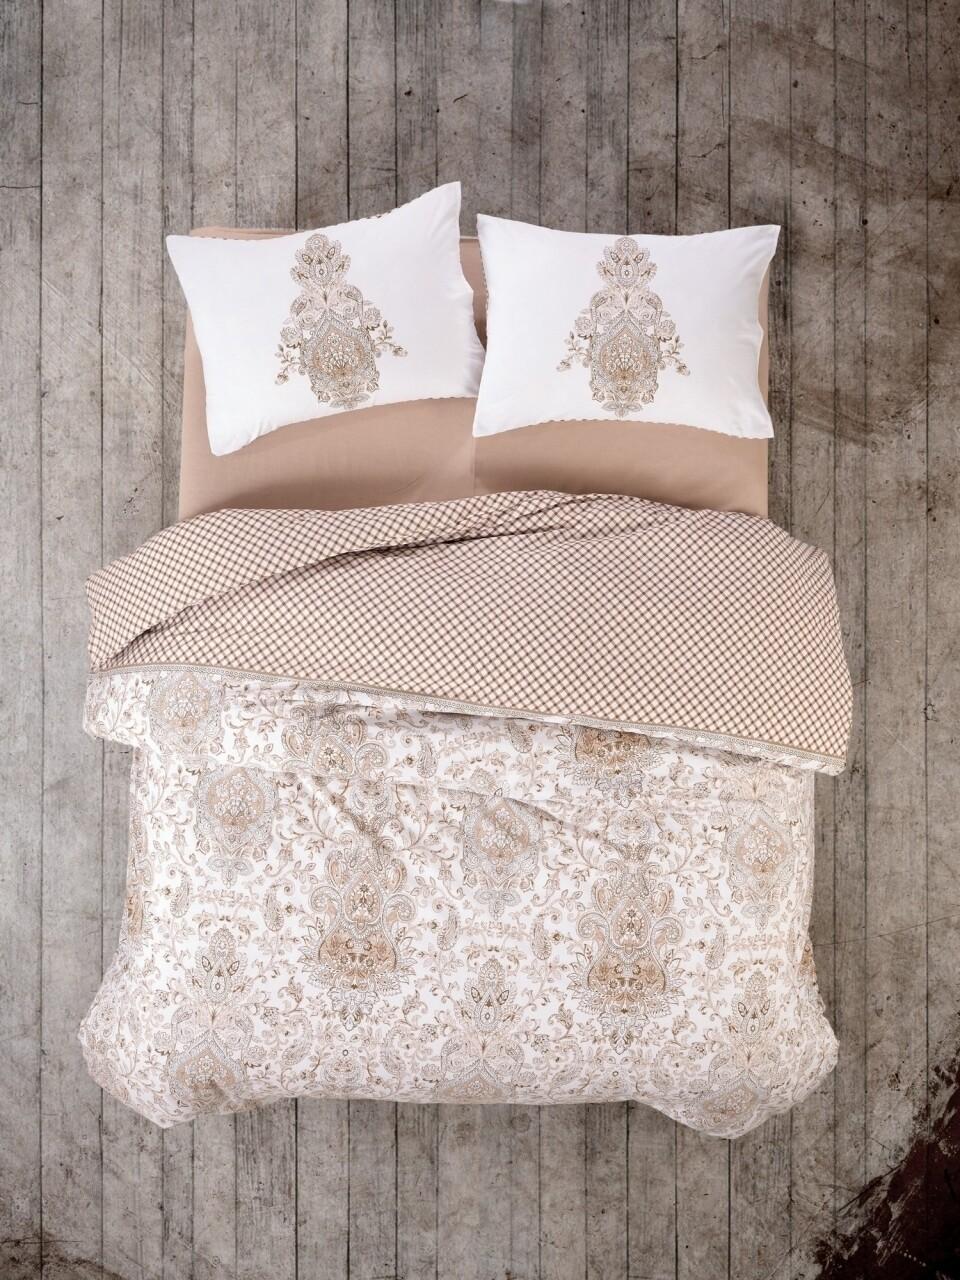 Lenjerie de pat pentru o persoana, 3 piese, 100% bumbac ranforce, Cotton Box, Tamara